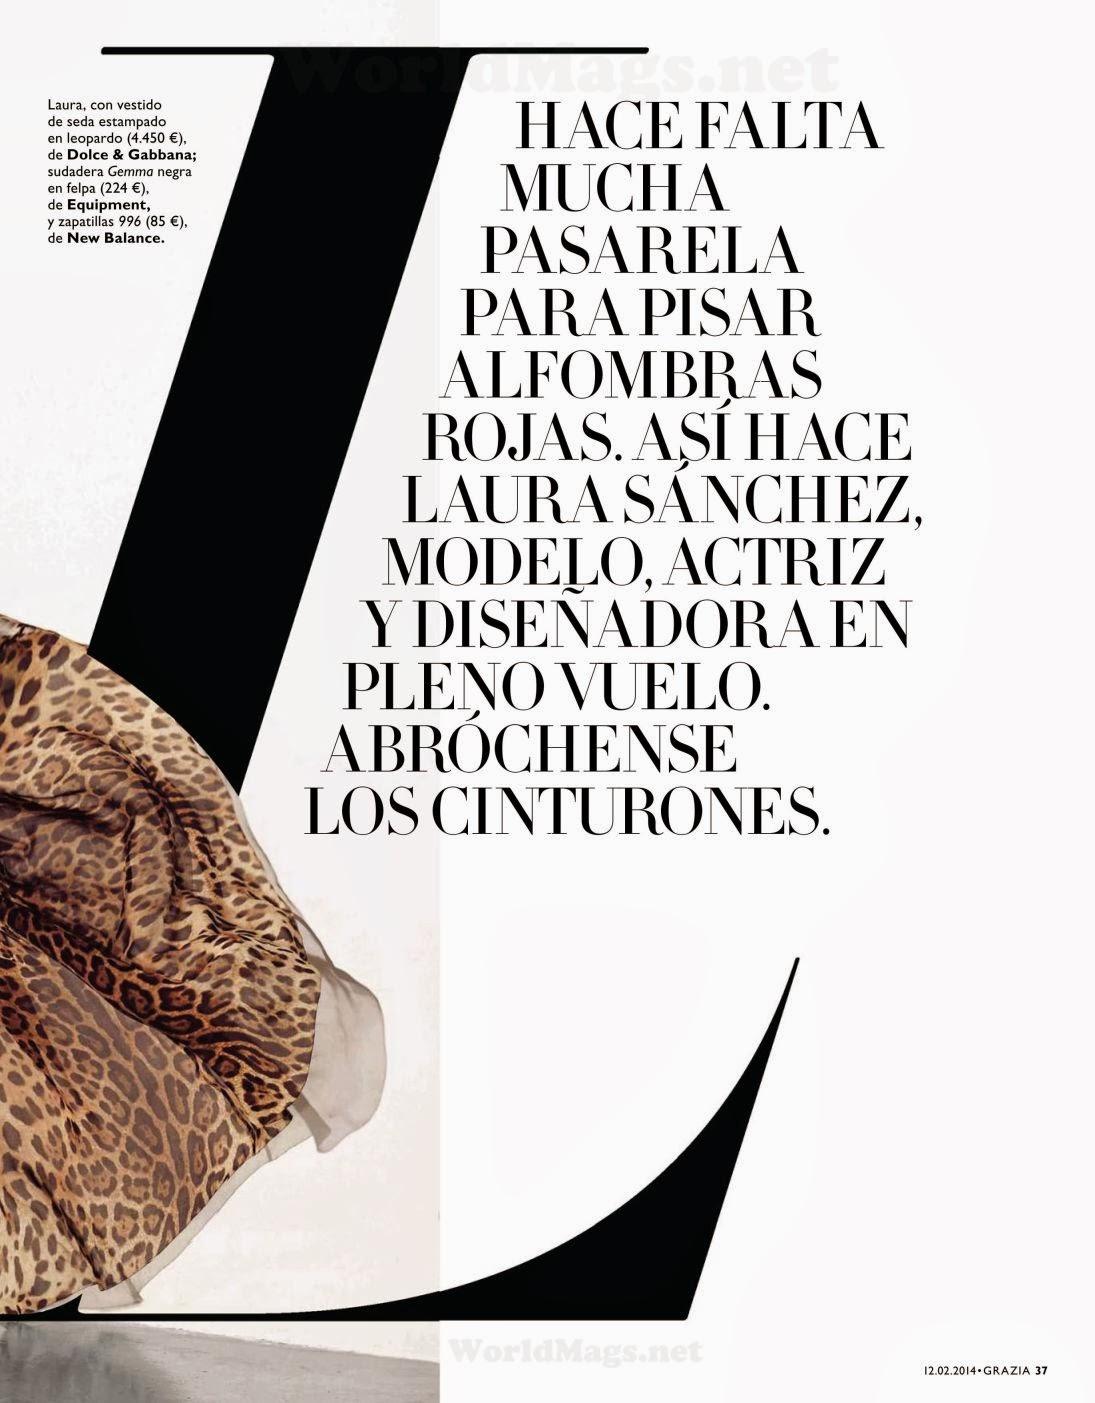 Laura Sanchez HQ Pictures Grazia Spain Magazine Photoshoot February 2014